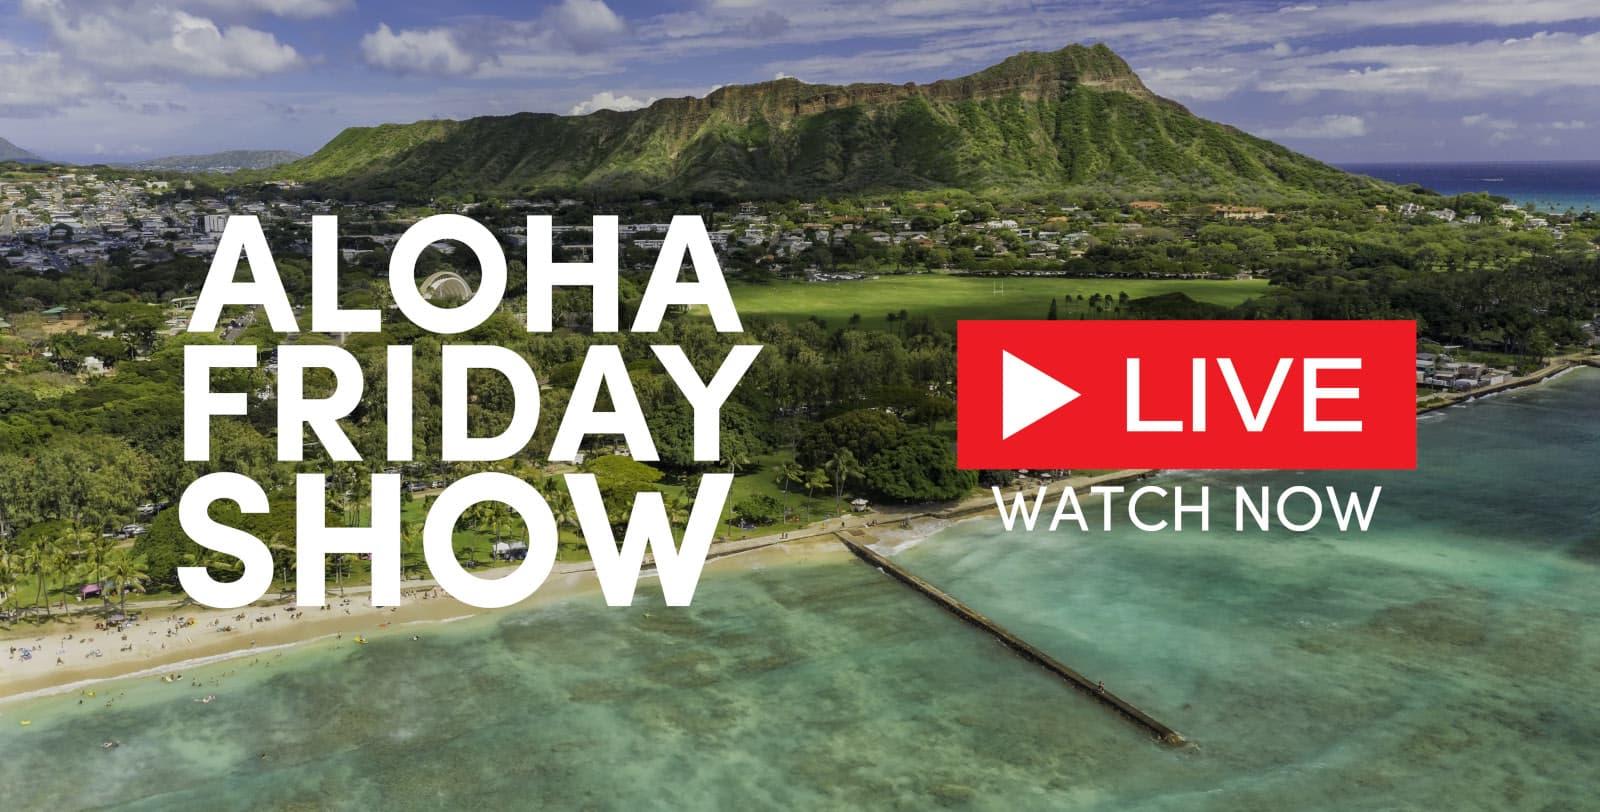 Aloha Friday Hawaii Show